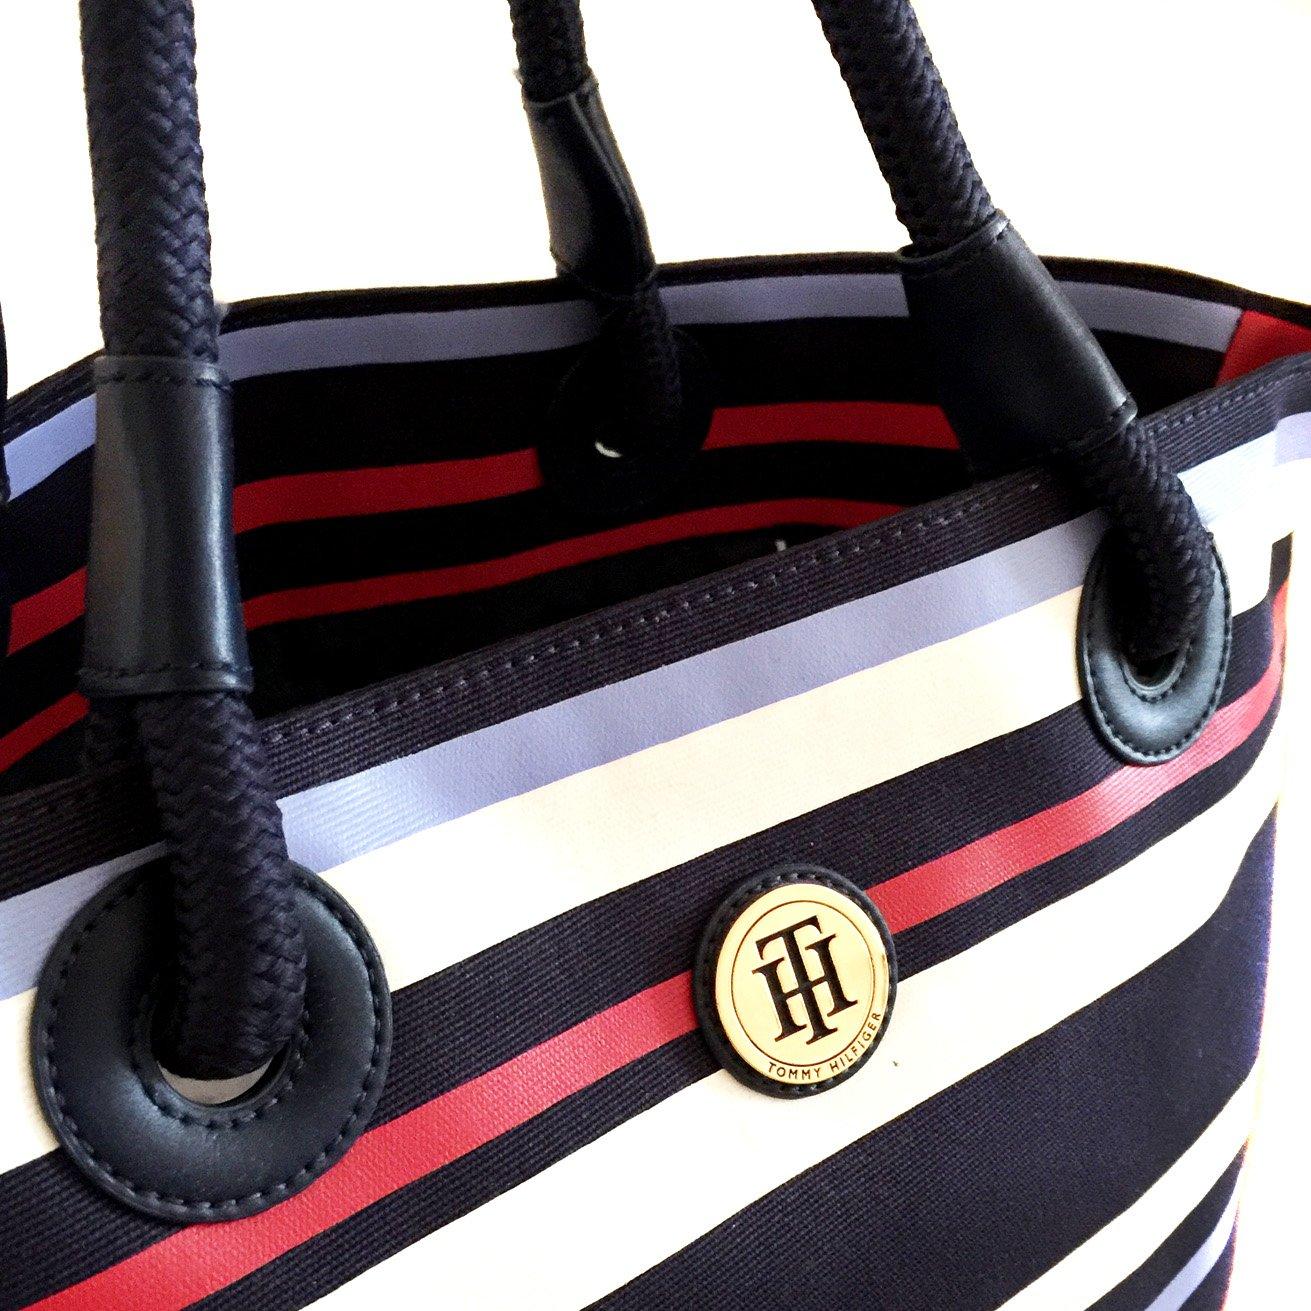 1270e5577 Tommy Hilfiger Womens Large Signature Stripe Canvas Tote Beach Bag Handbag:  Amazon.co.uk: Shoes & Bags